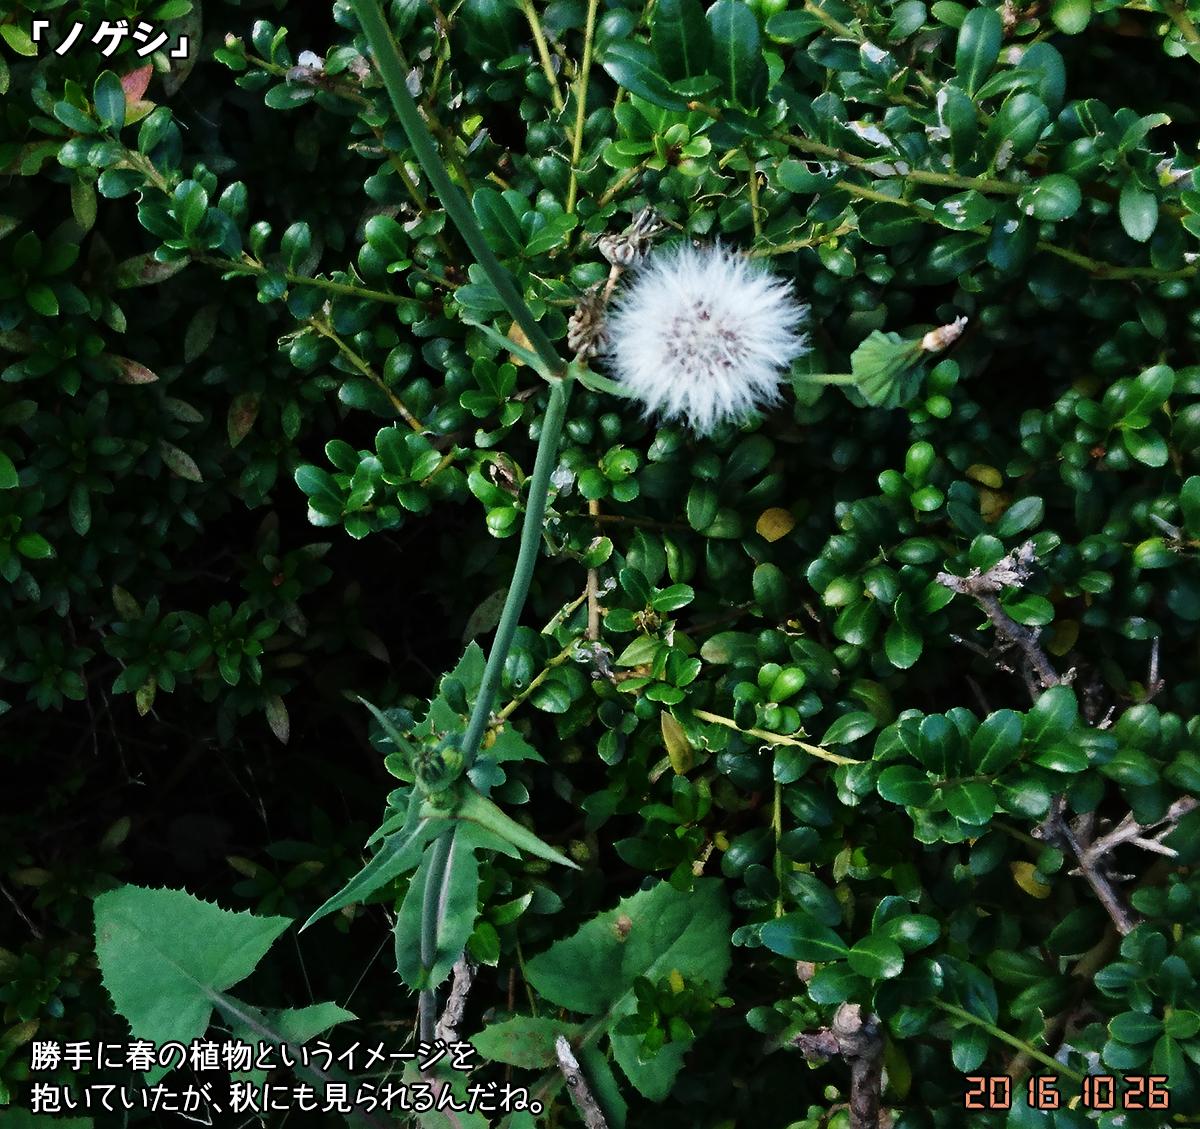 DSC_0343_2.jpg